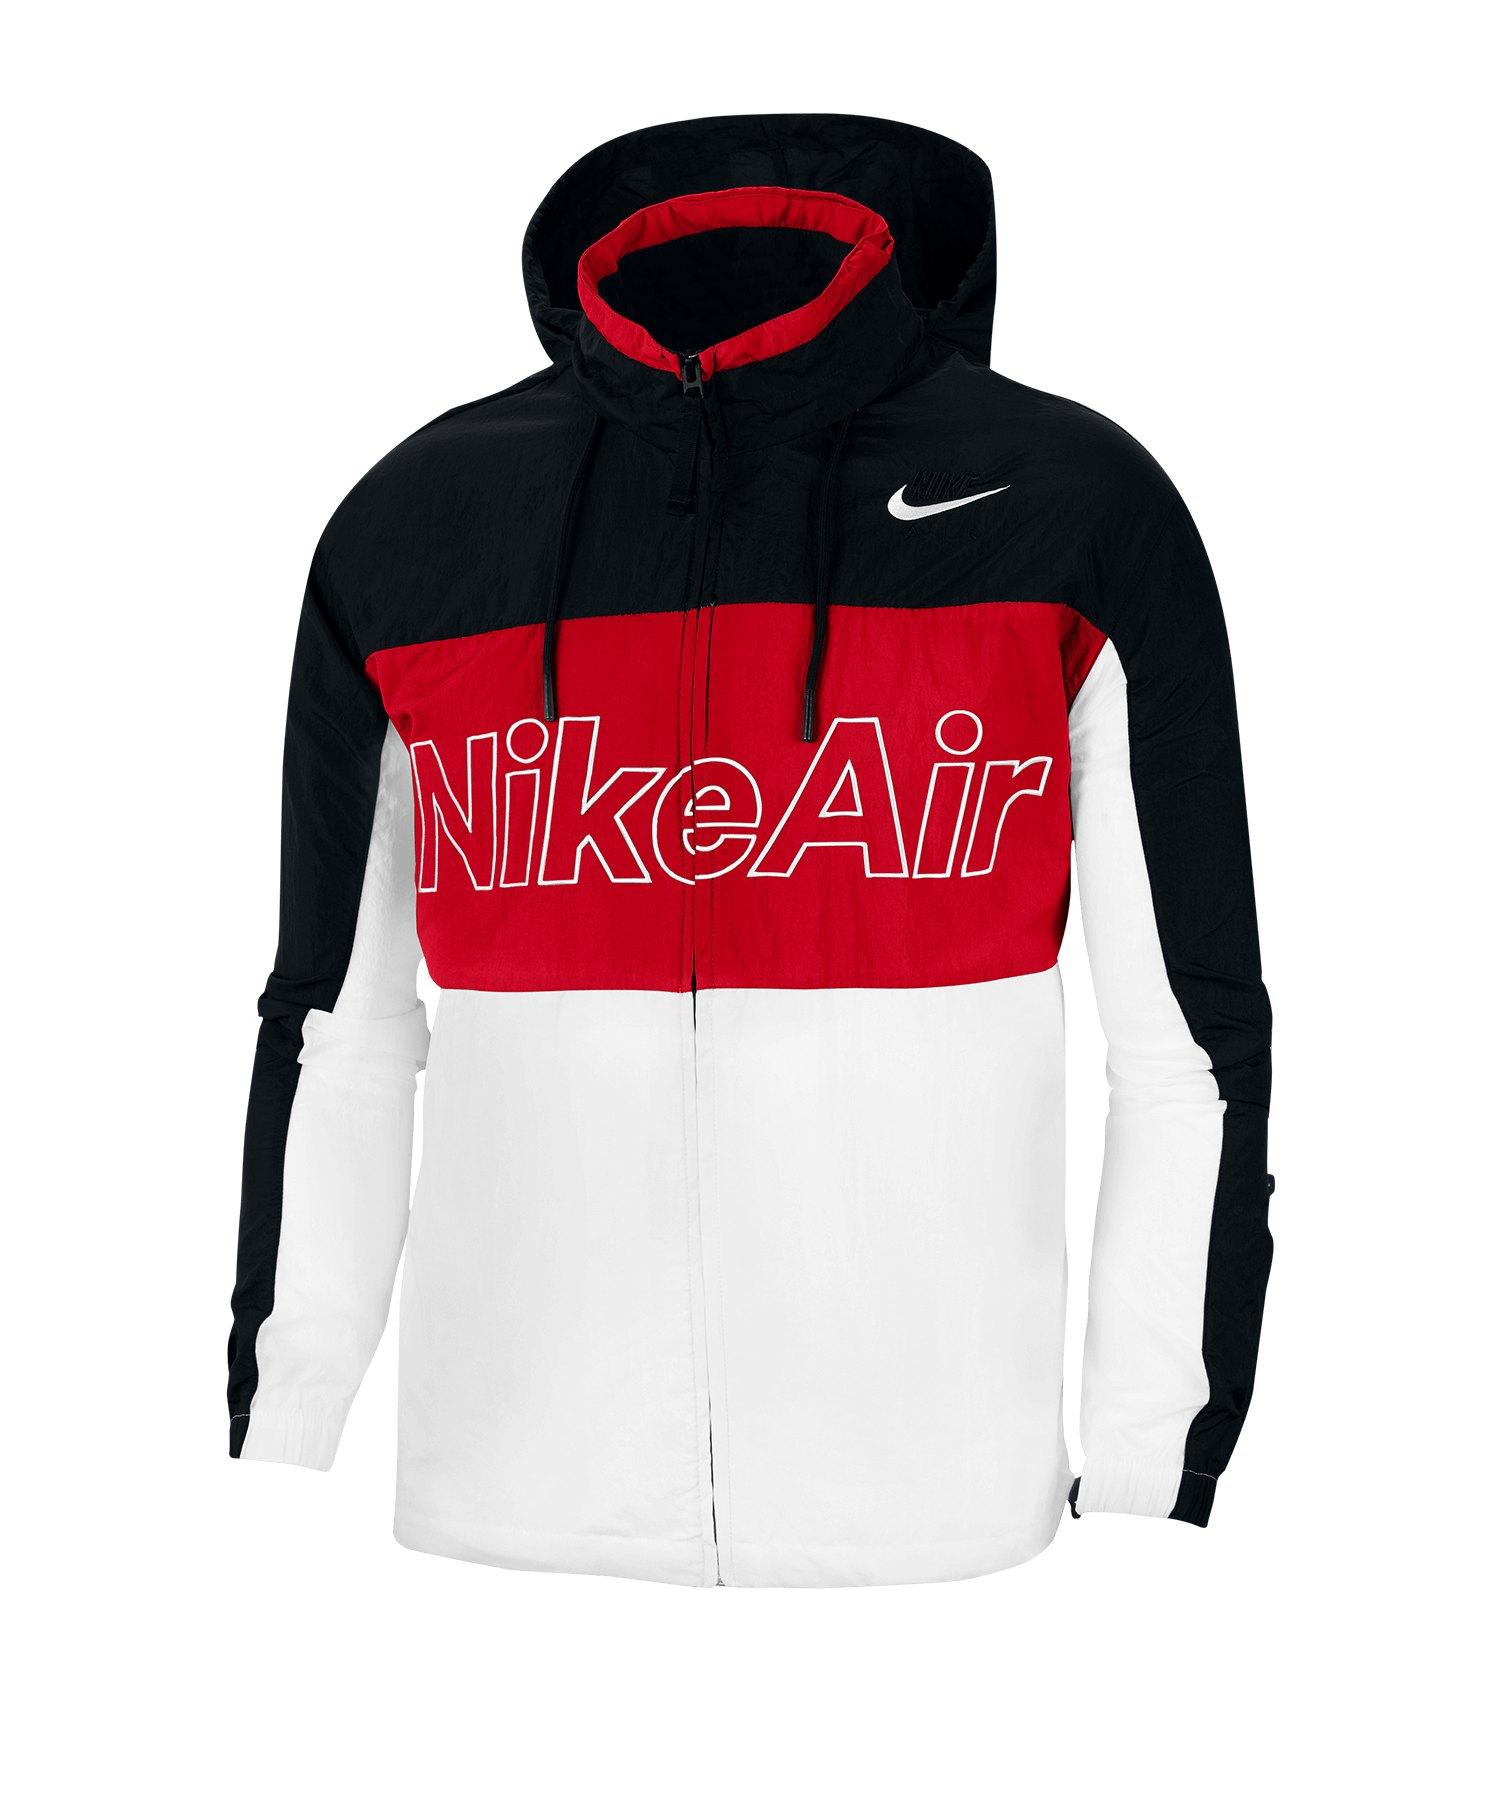 Nike Air Woven Jacket Jacke Schwarz F011 - schwarz